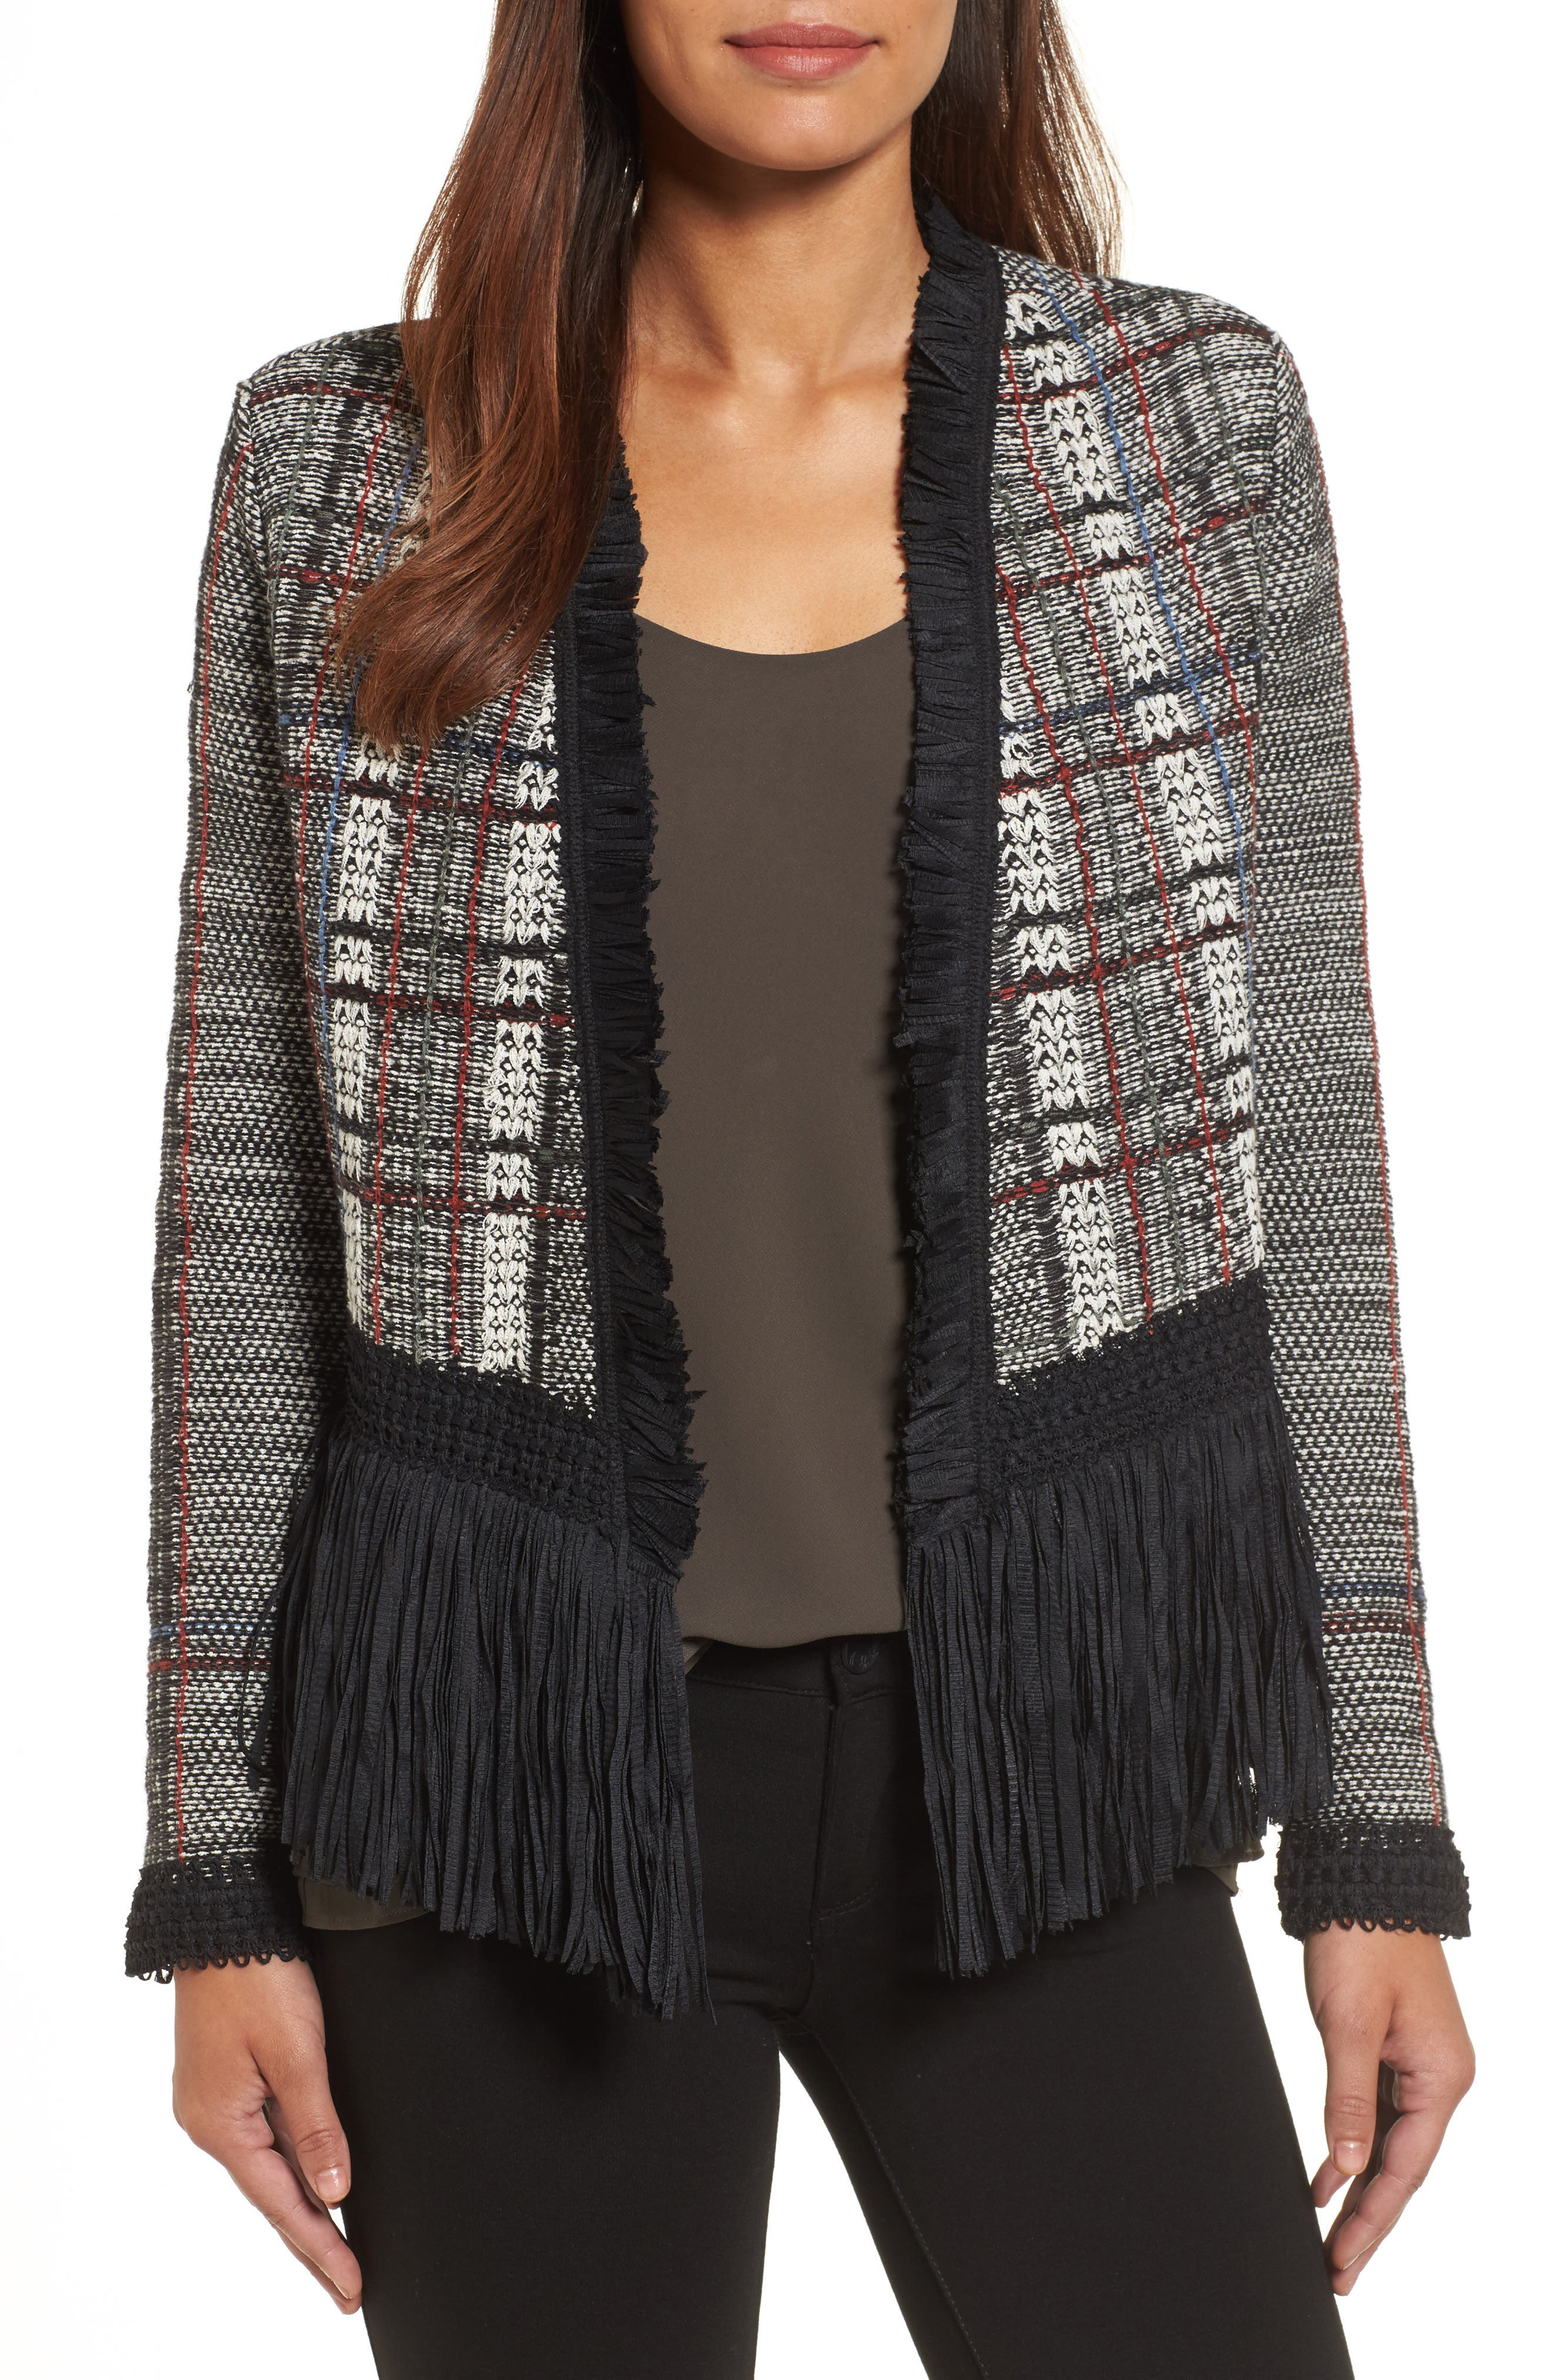 Alternate Image 1 Selected - NIC+ZOE Plaid Tweed Fringe Jacket (Regular & Petite)